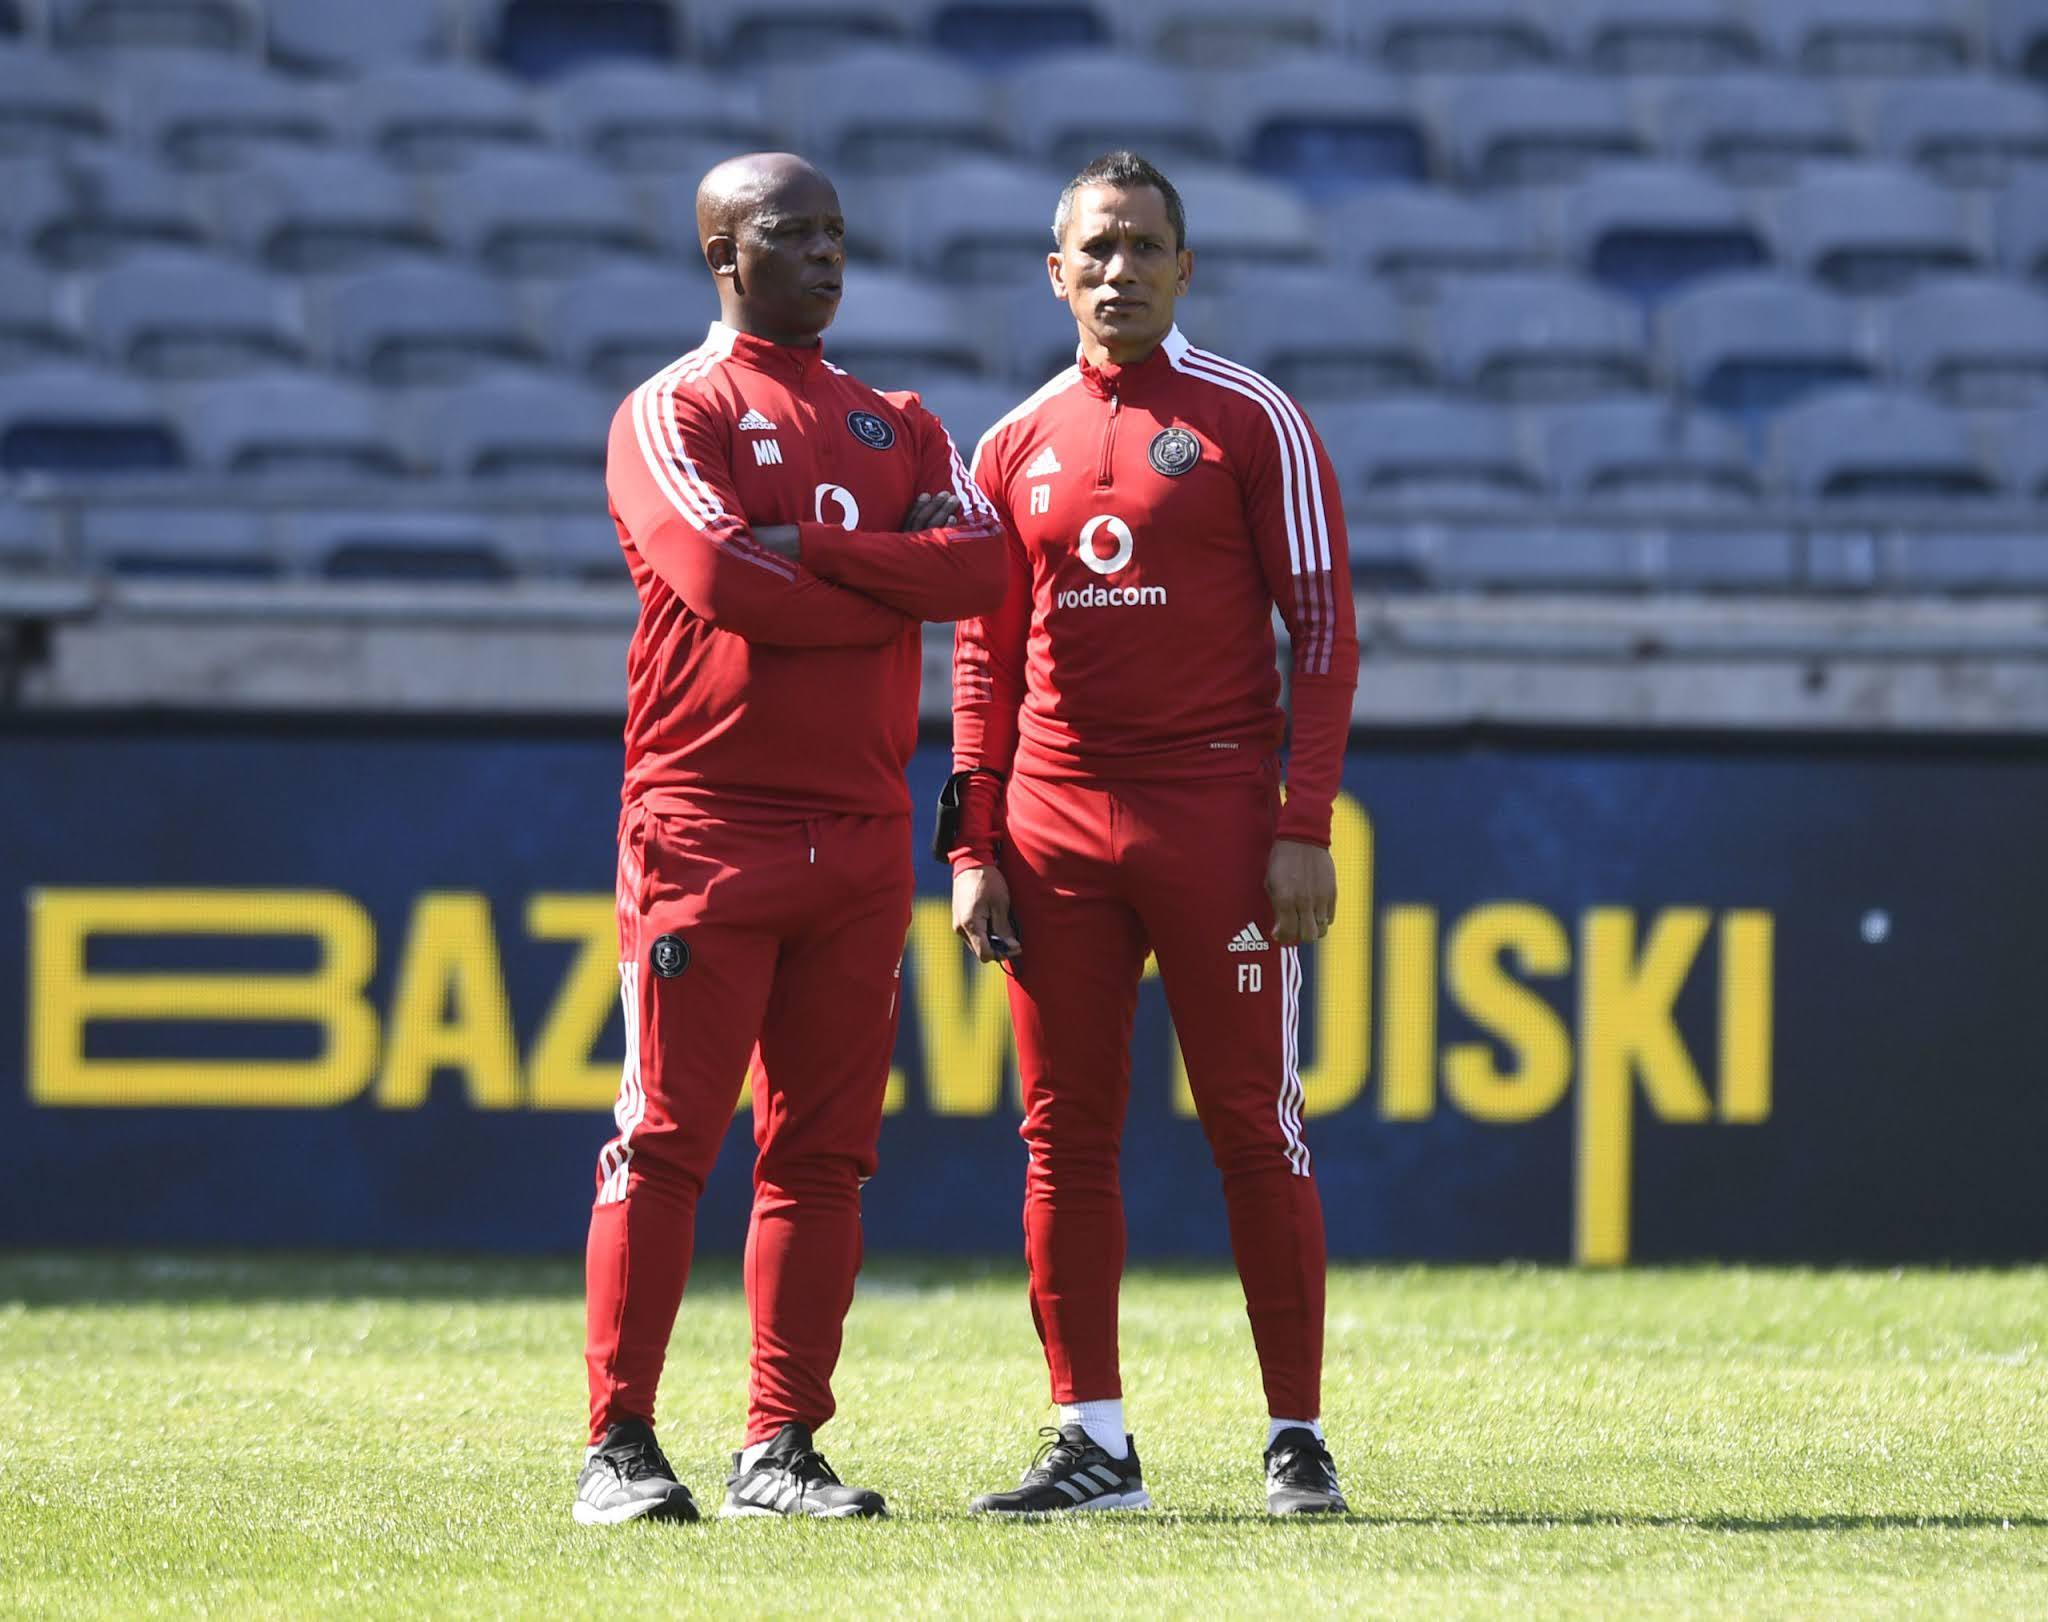 Orlando Pirates interim co-coaches Mandla Ncikazi and Fadlu Davids